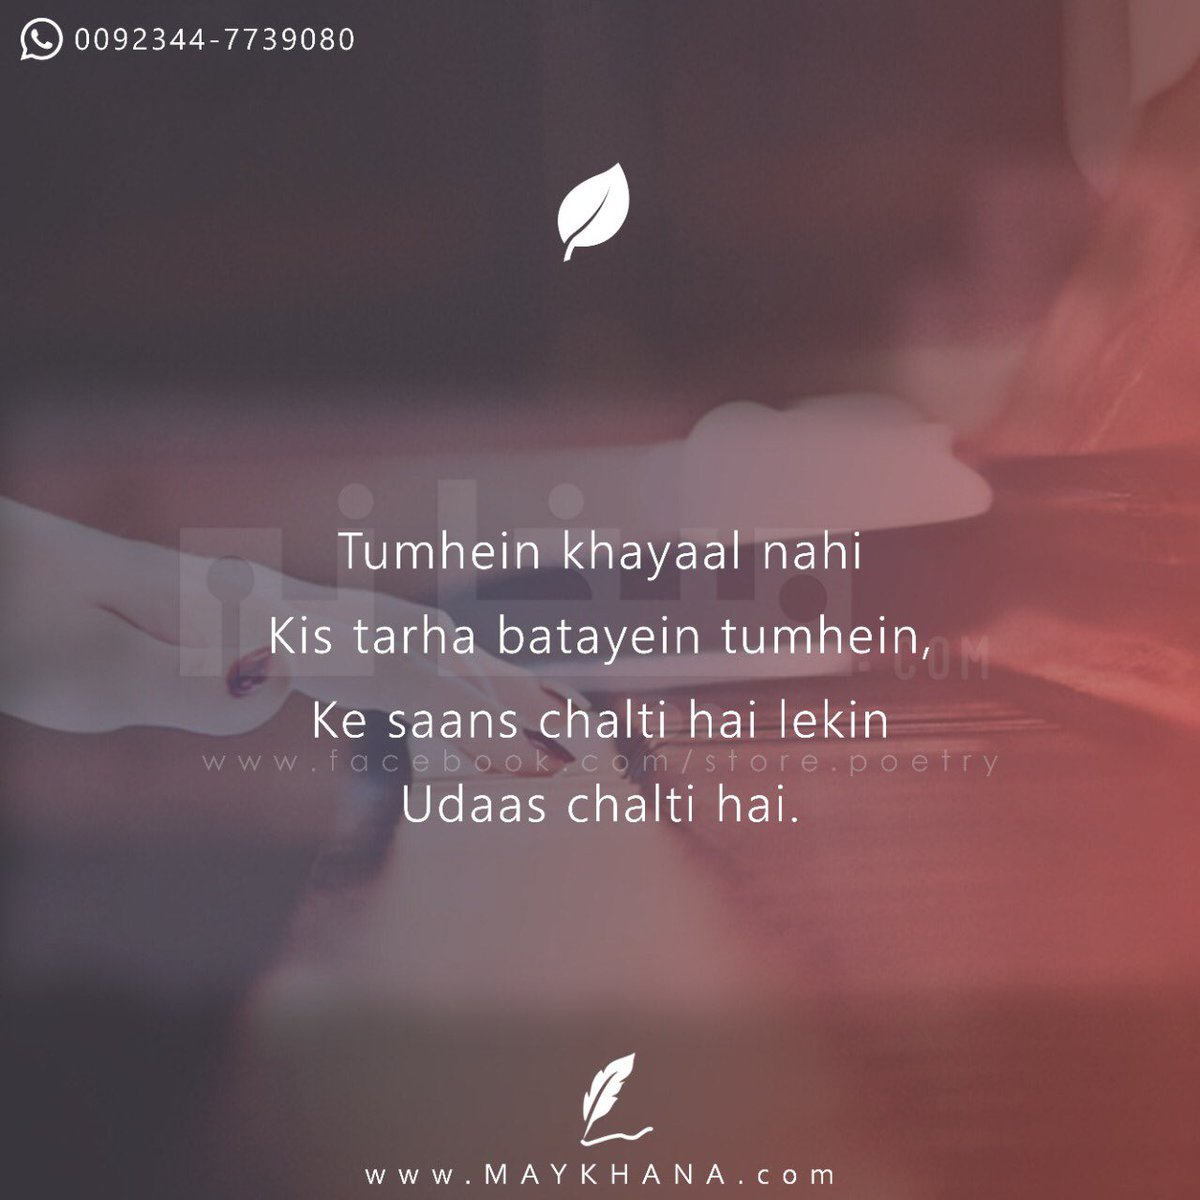 Follow us on facebook or subscribe us on Whatsapp/Viber for more. #maykhana #urdupoetry #maikhana #sadpoetry #sufism #maykhanapoetry  #besturdupoetry #sufipoetry #qalandar #qalandarPoetry https://t.co/RXmd8NPbx4